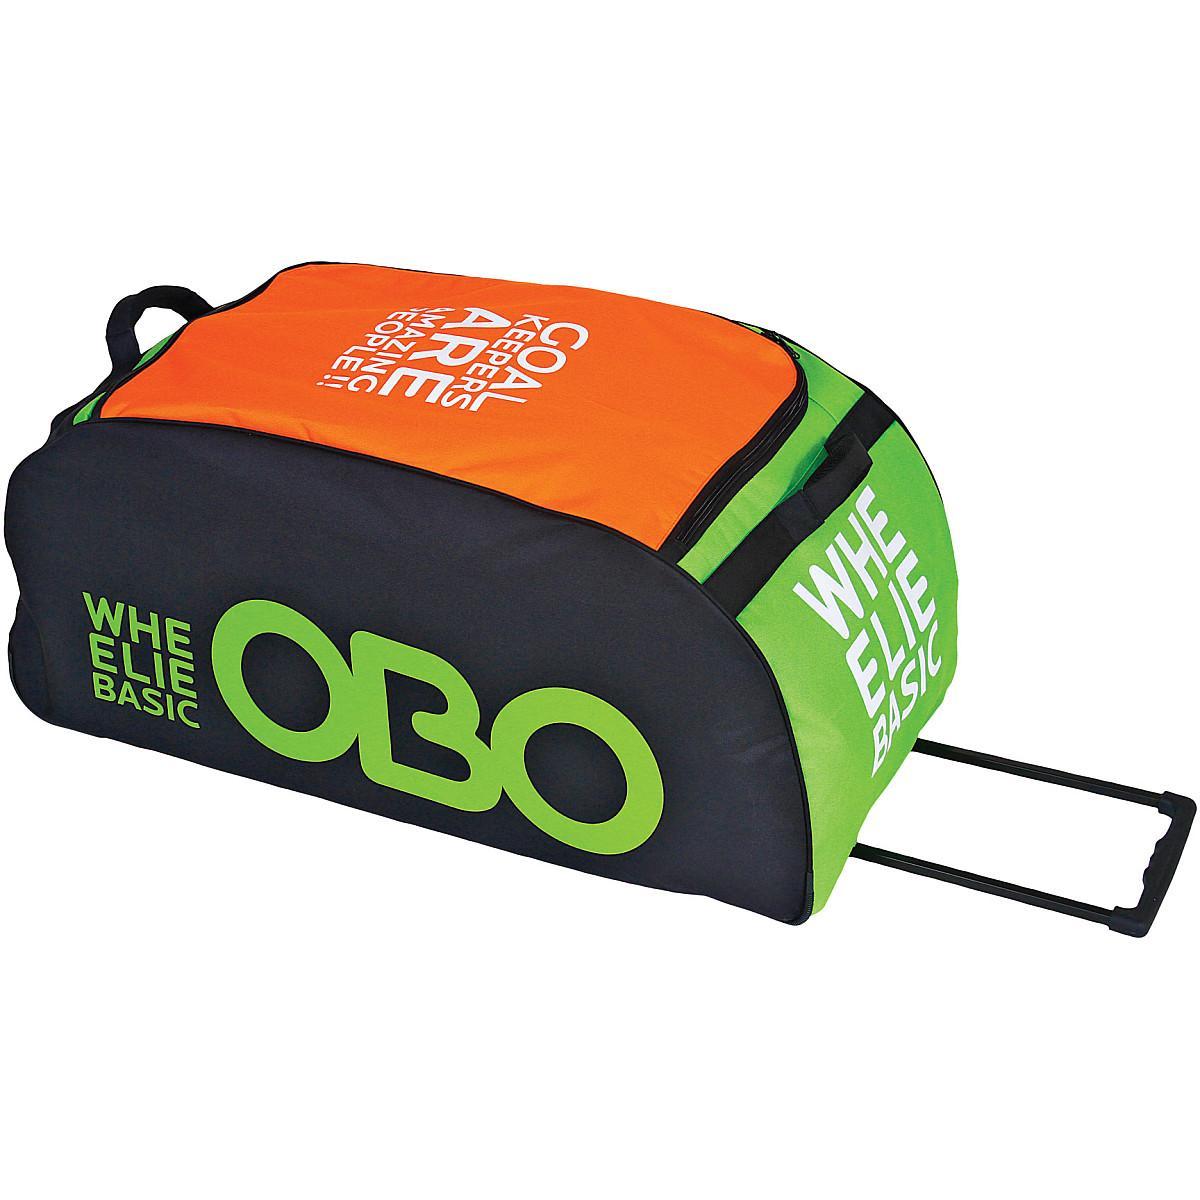 Obo Wheelie Basic Field Hockey Goalie Bag Ebay